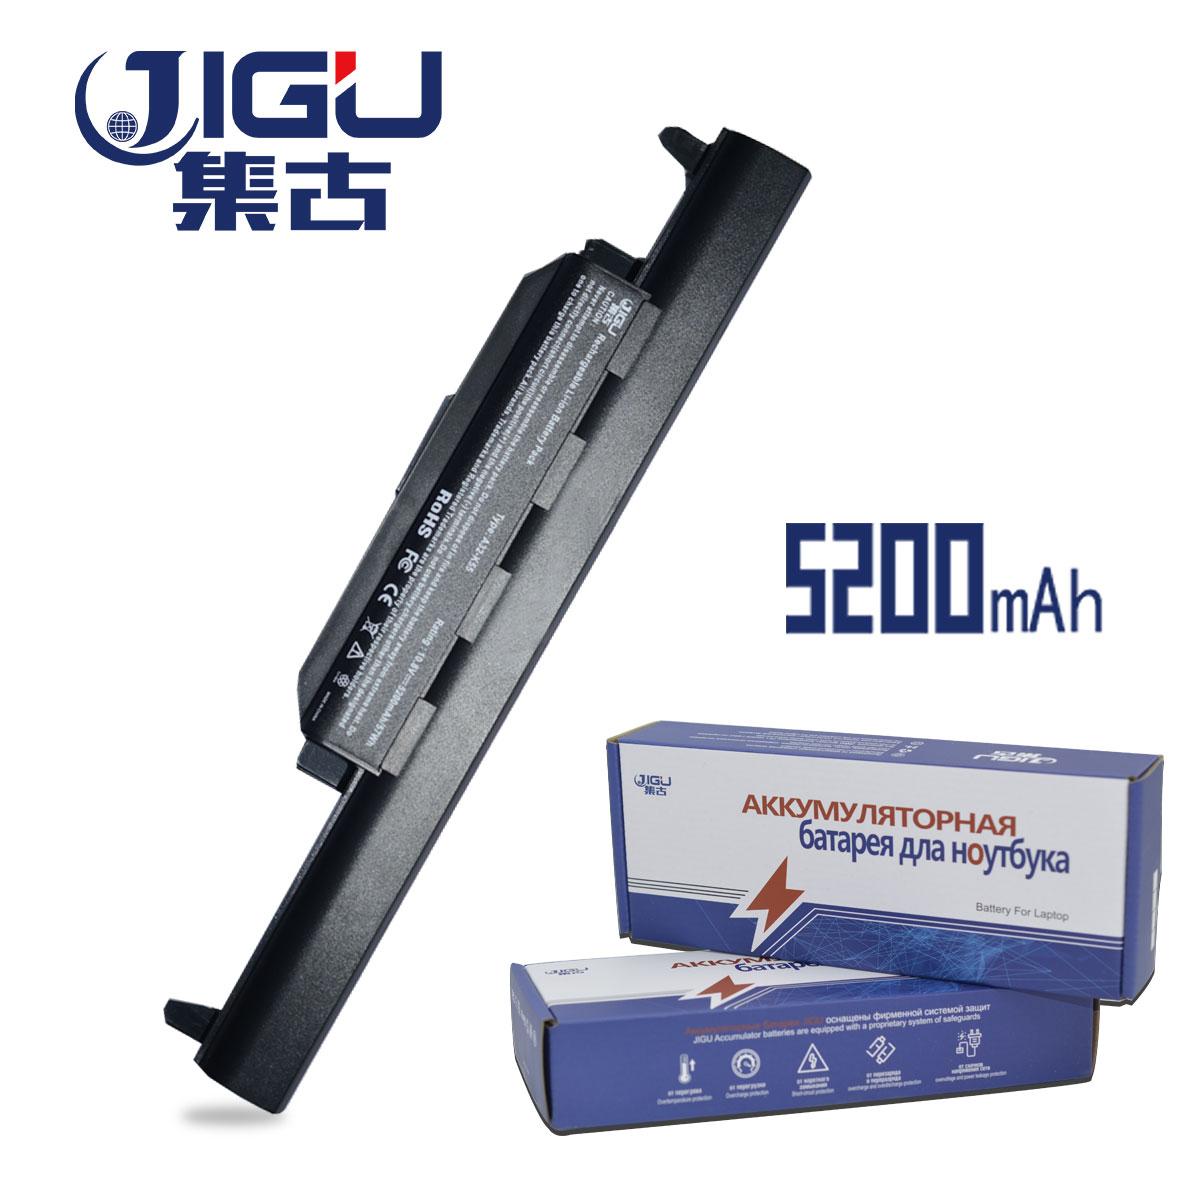 JIGU X55a Laptop Battery For ASUS K45A K45DE K45DR K45N K45VD K45VG K45VM K45VS A55A A55D A55DE A55DR A55N A55VD A55VM A55VS